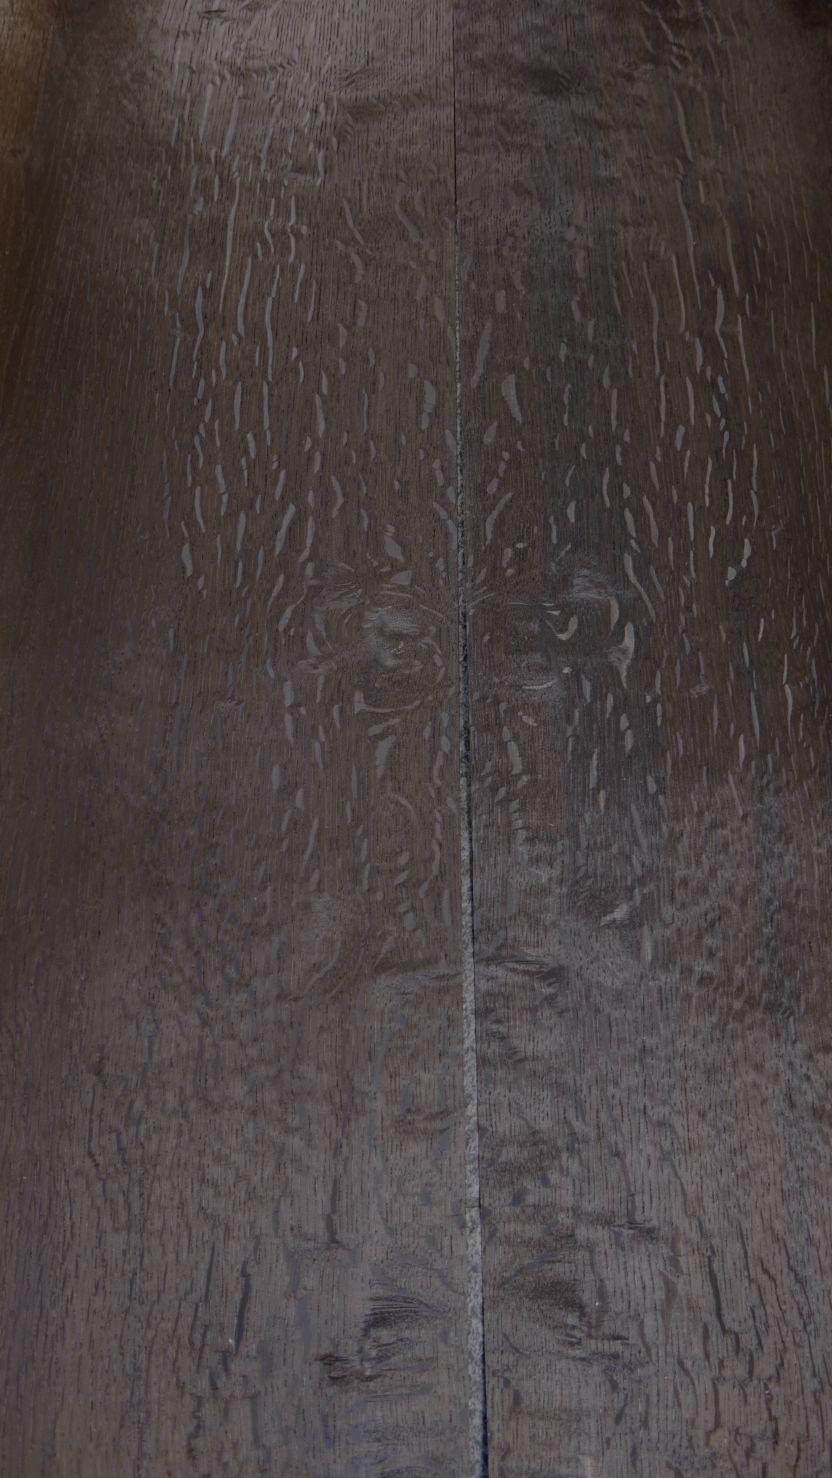 A0248x-2 Europees Gerookt Eiken Gespiegeld 18-24x236cm 30st